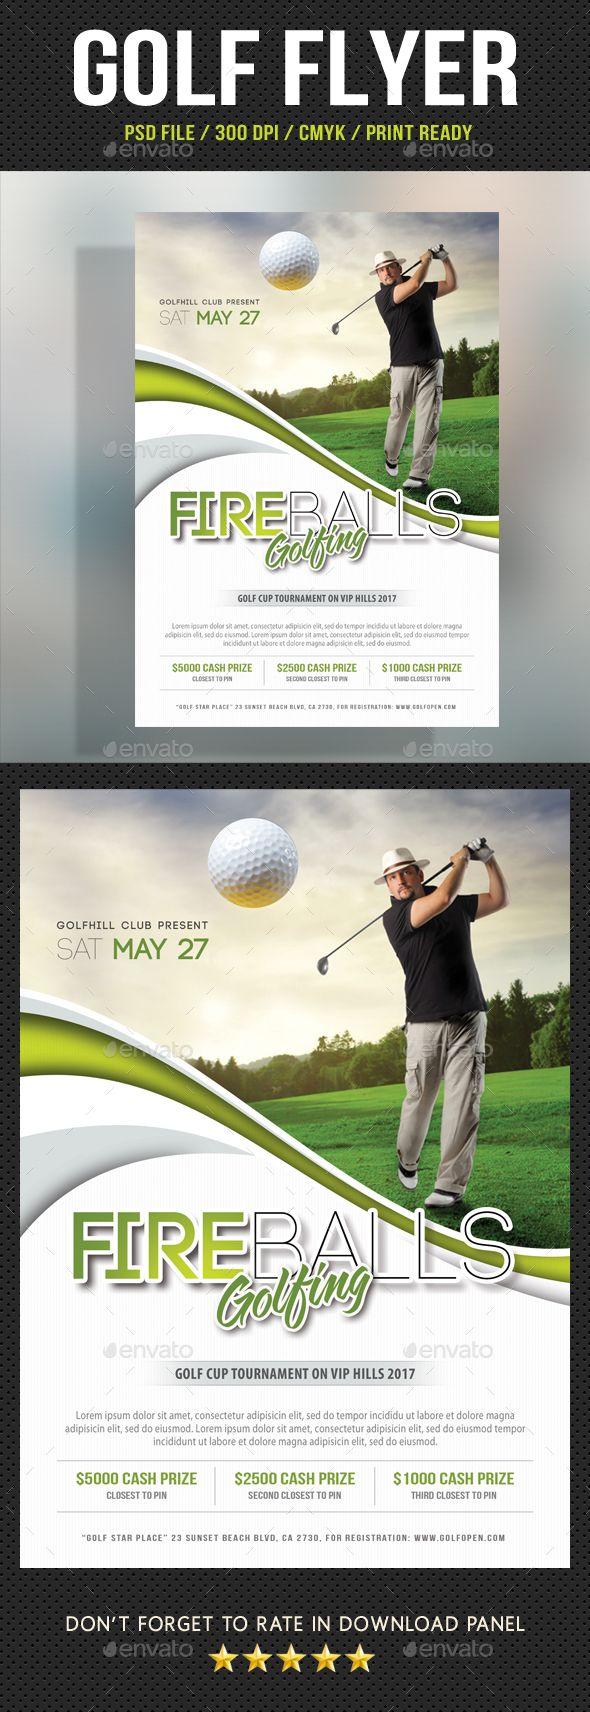 8 best golf poster ideas images on pinterest golf invitation golf flyer template 07 fandeluxe Gallery